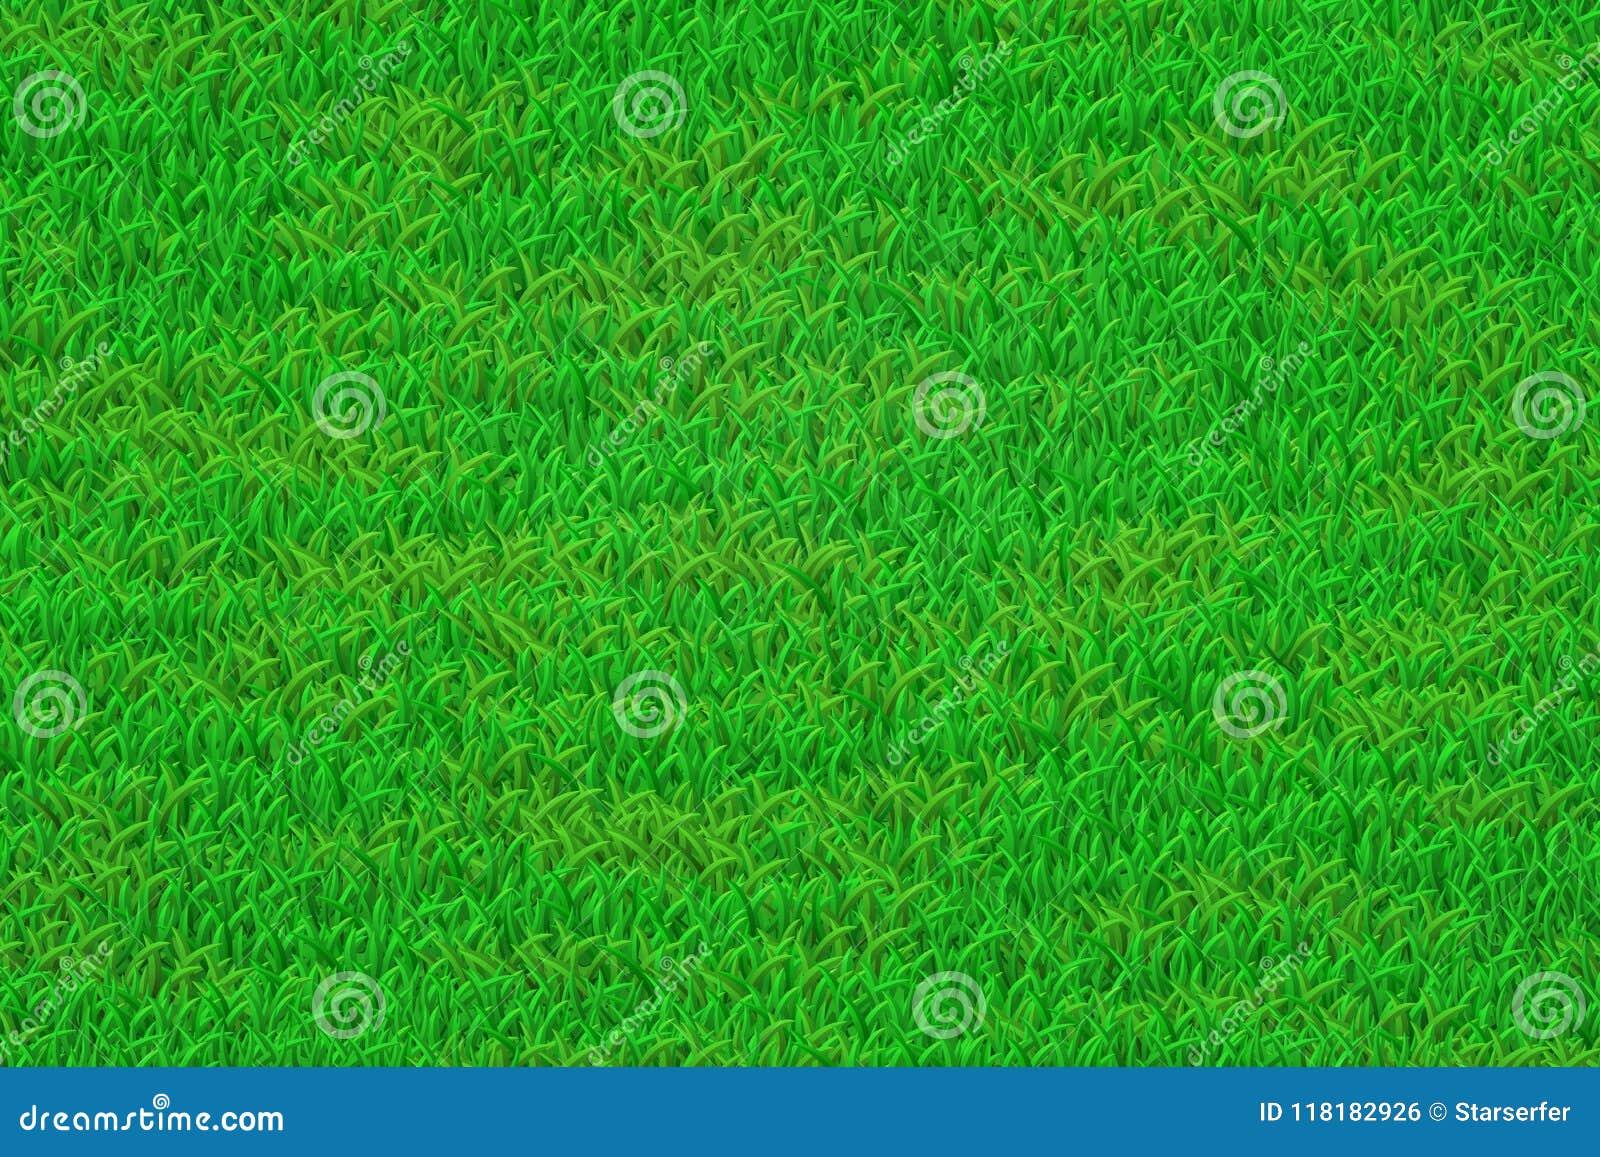 Green grass lawn background